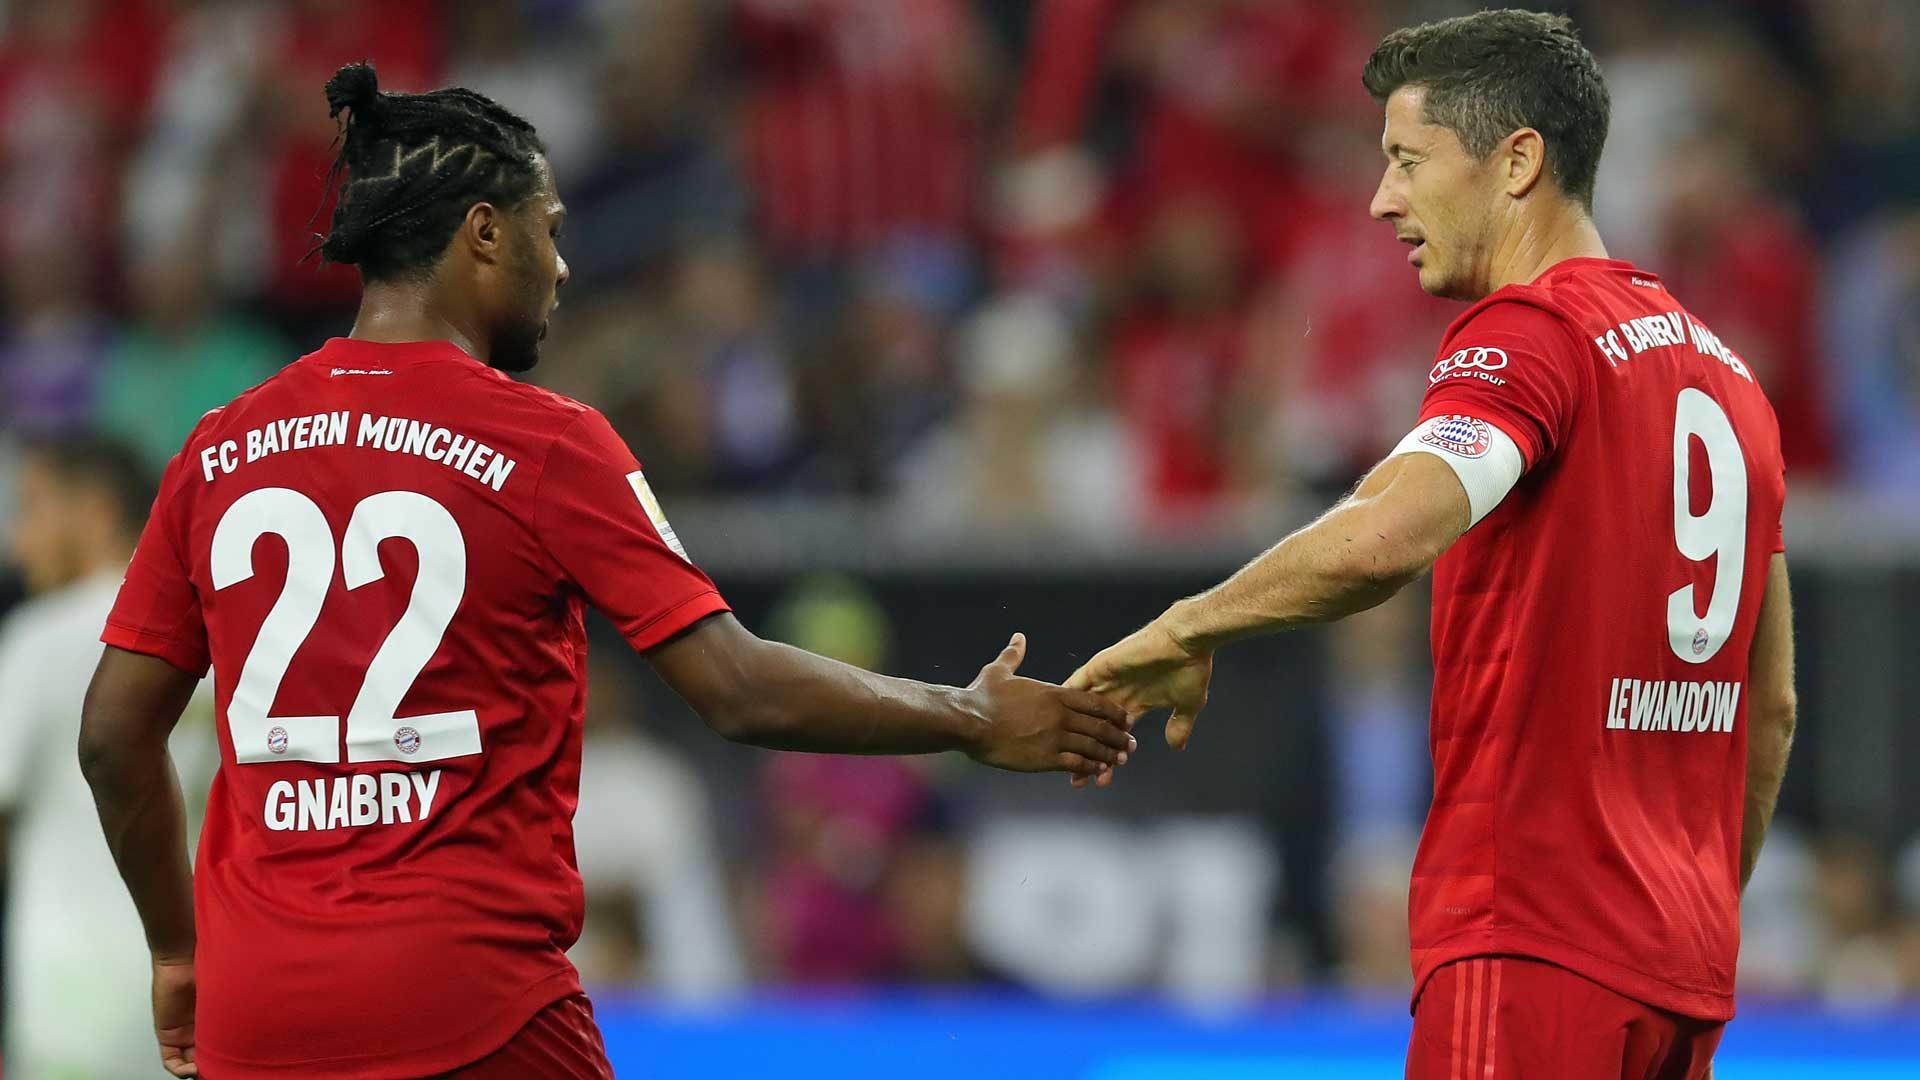 Lewandowski strikes again as Bayern defeat Real Madrid